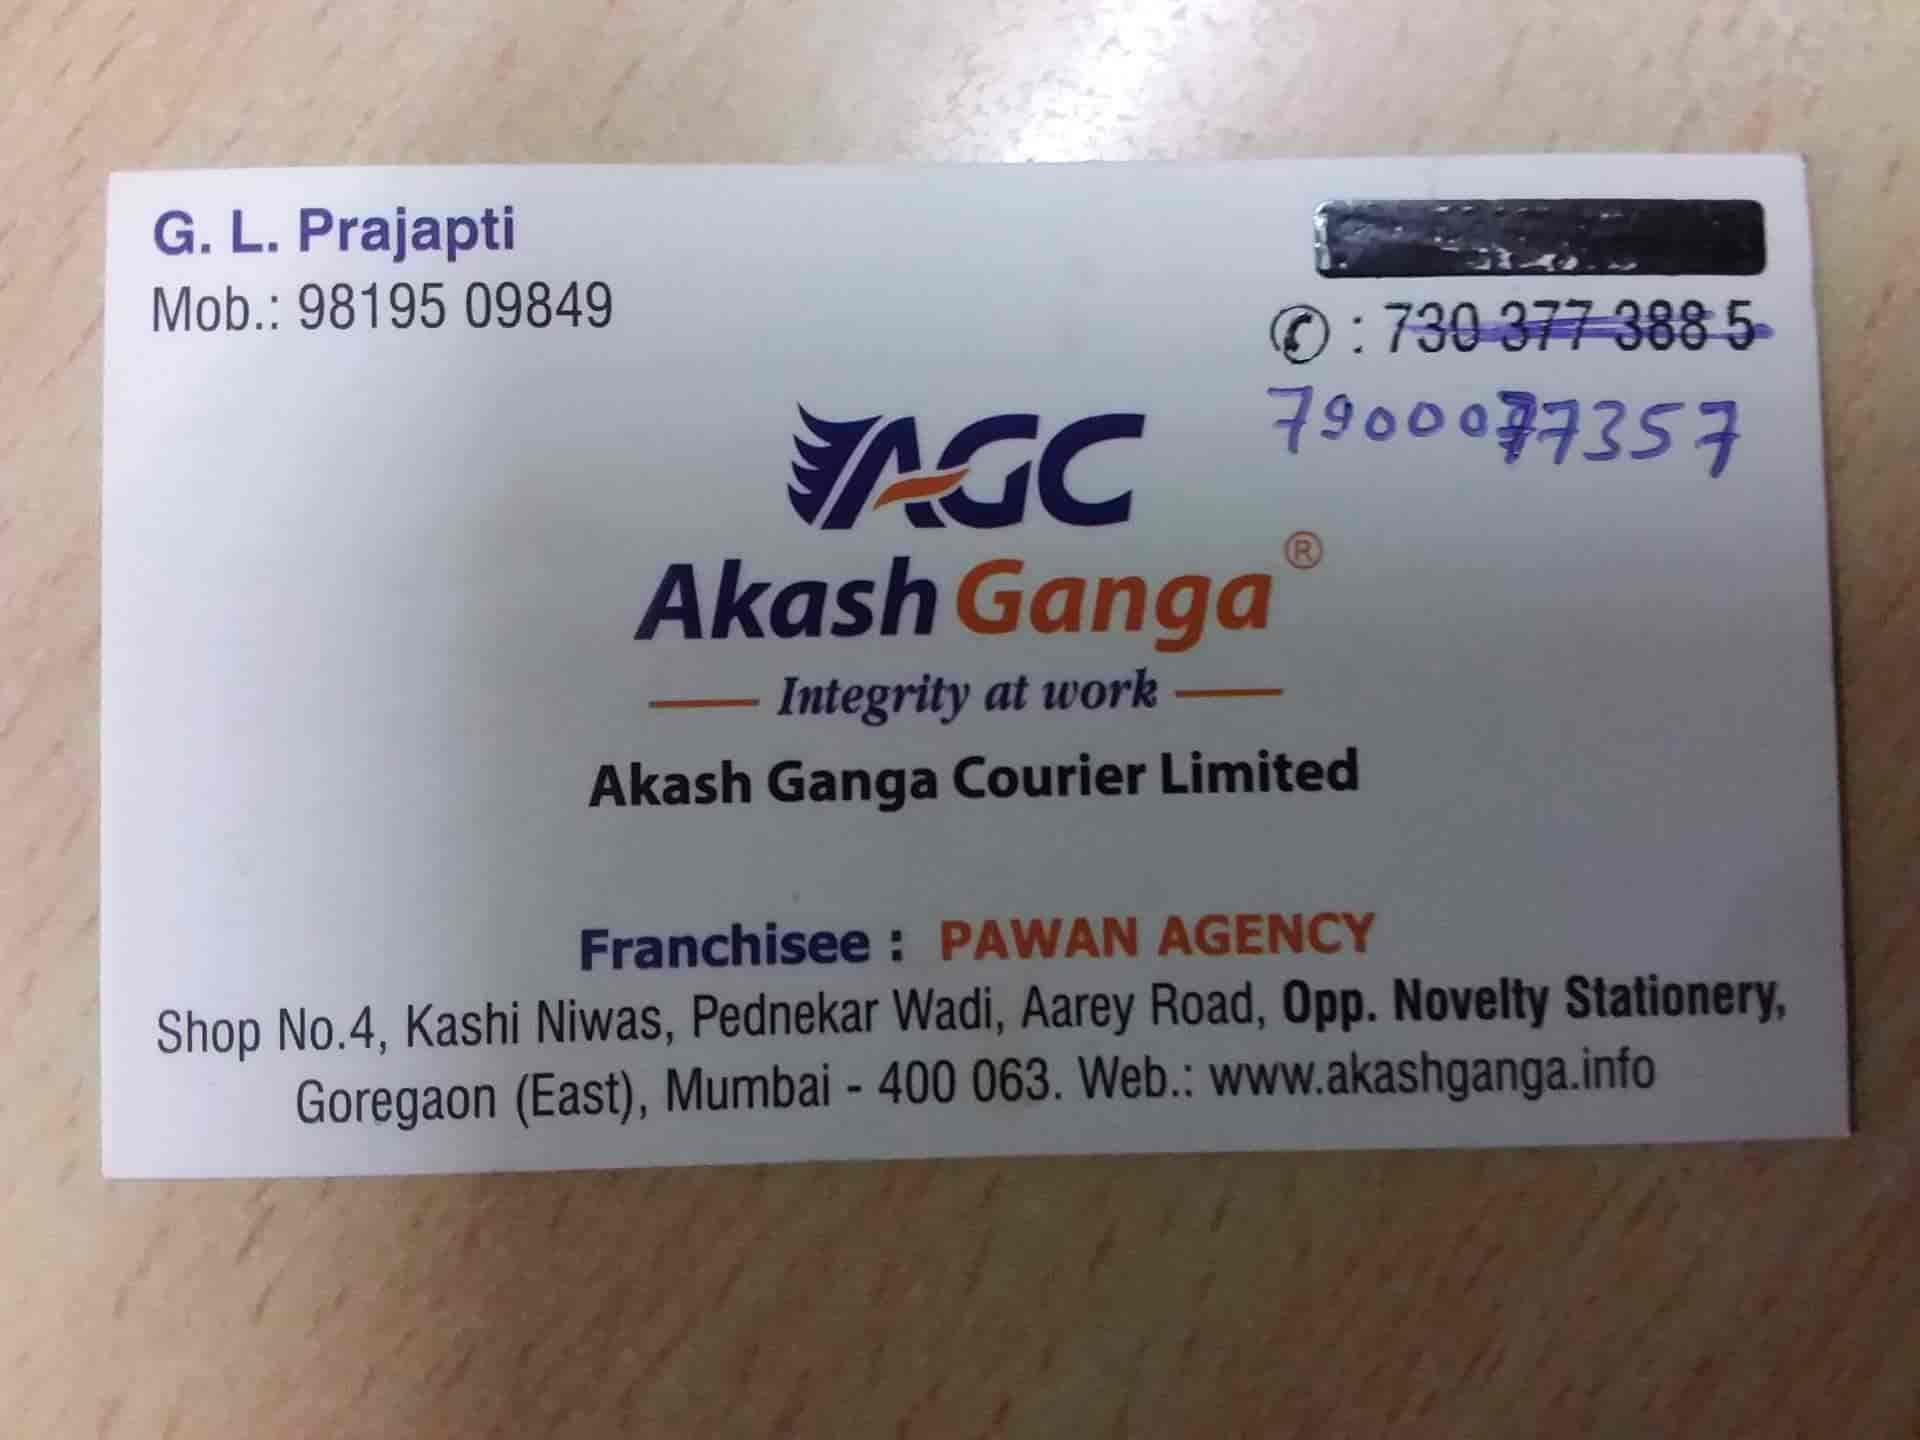 Akash Ganga Courier Ltd, Goregaon East - Domestic Courier